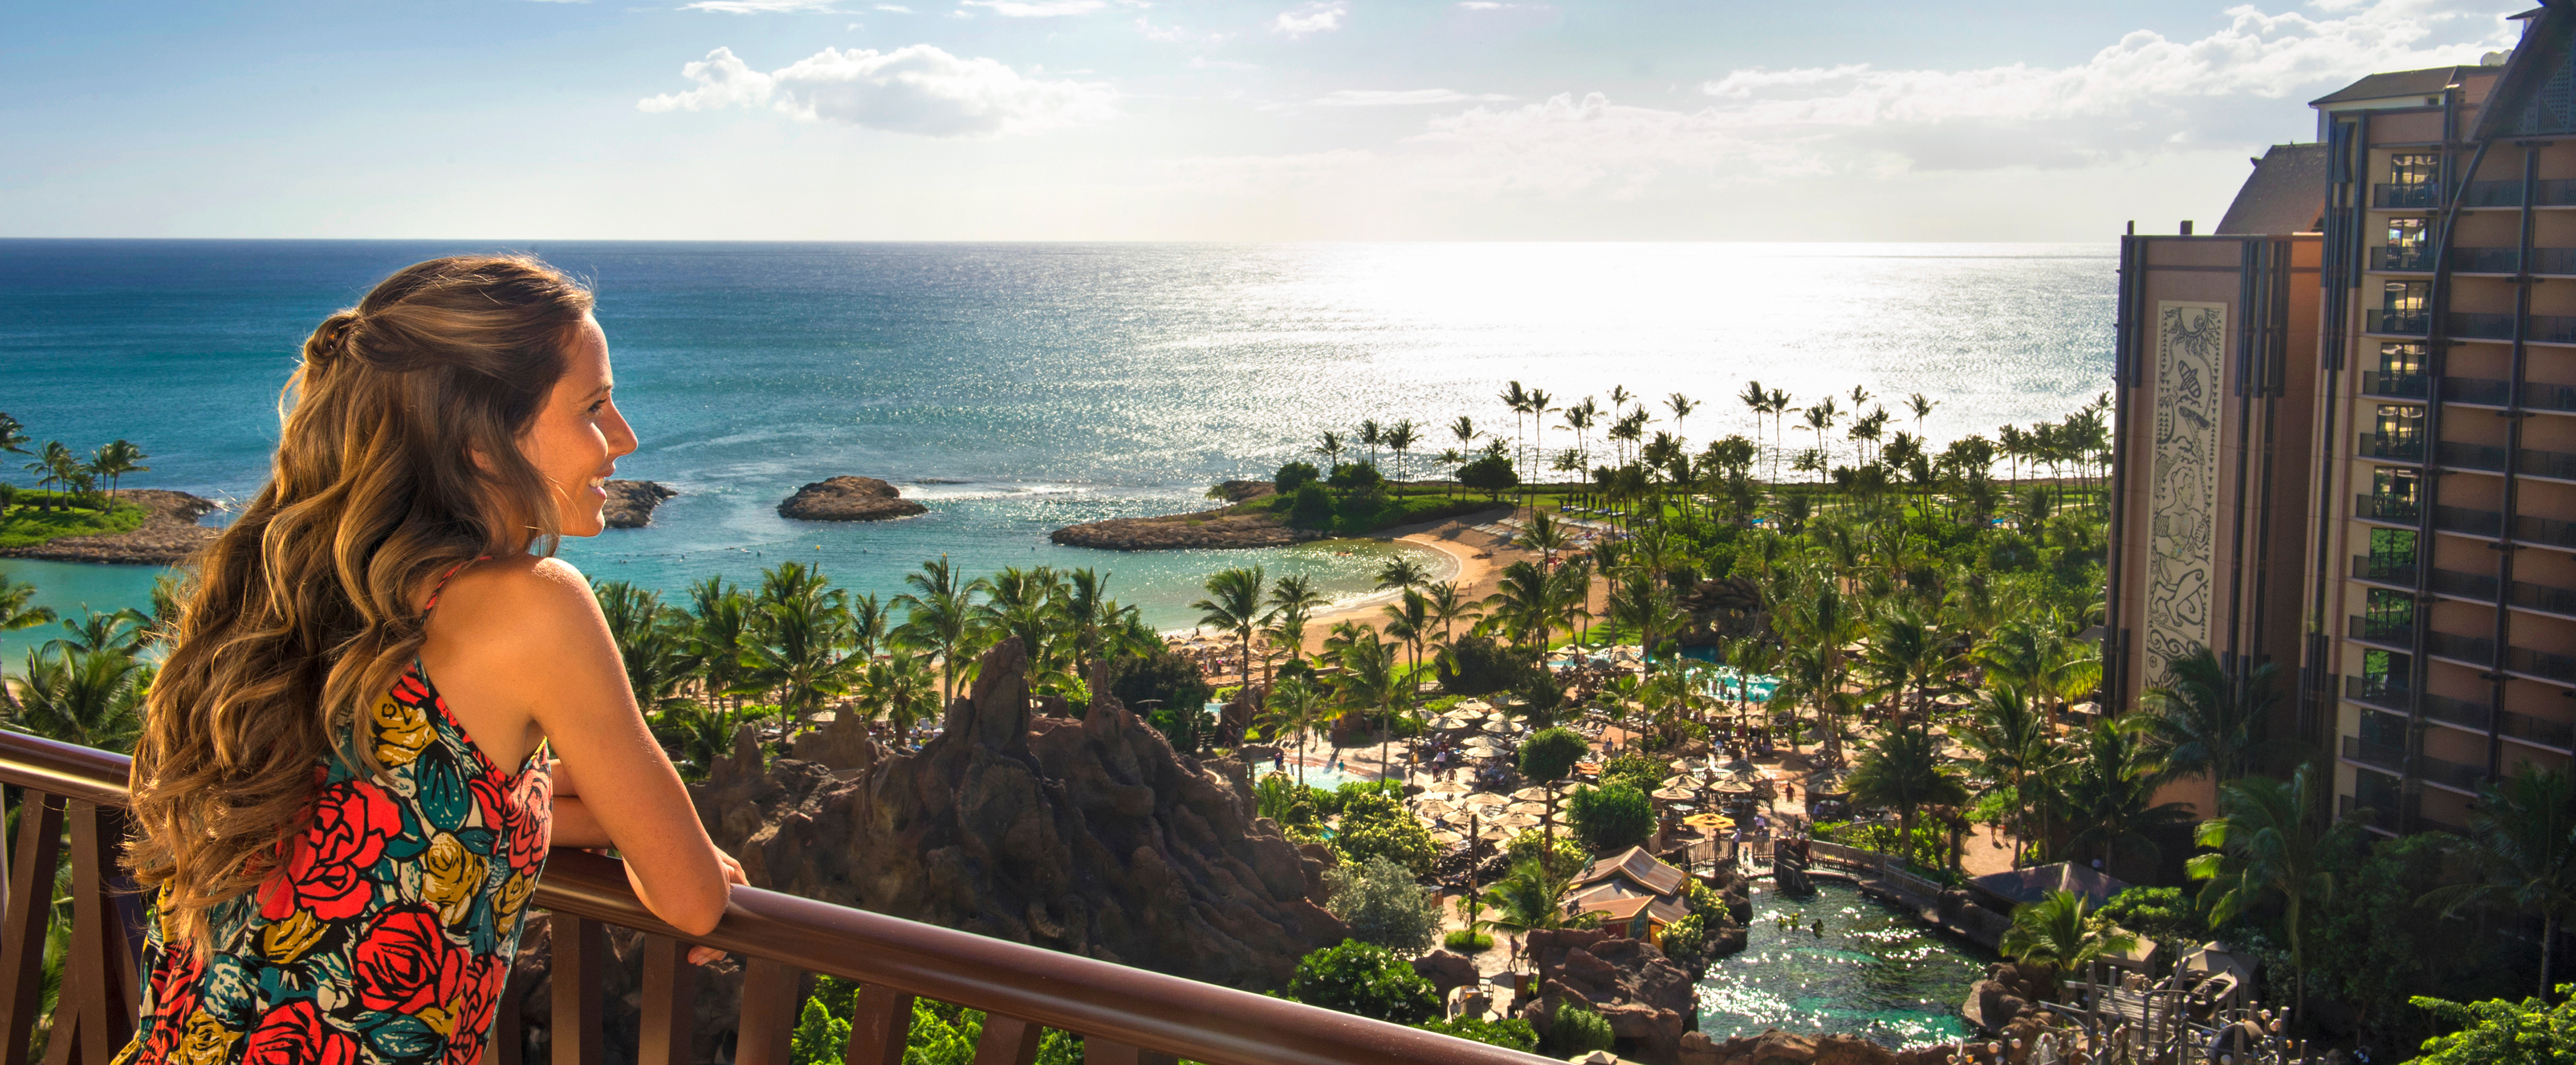 Aulani Hawaii Resort & Spa